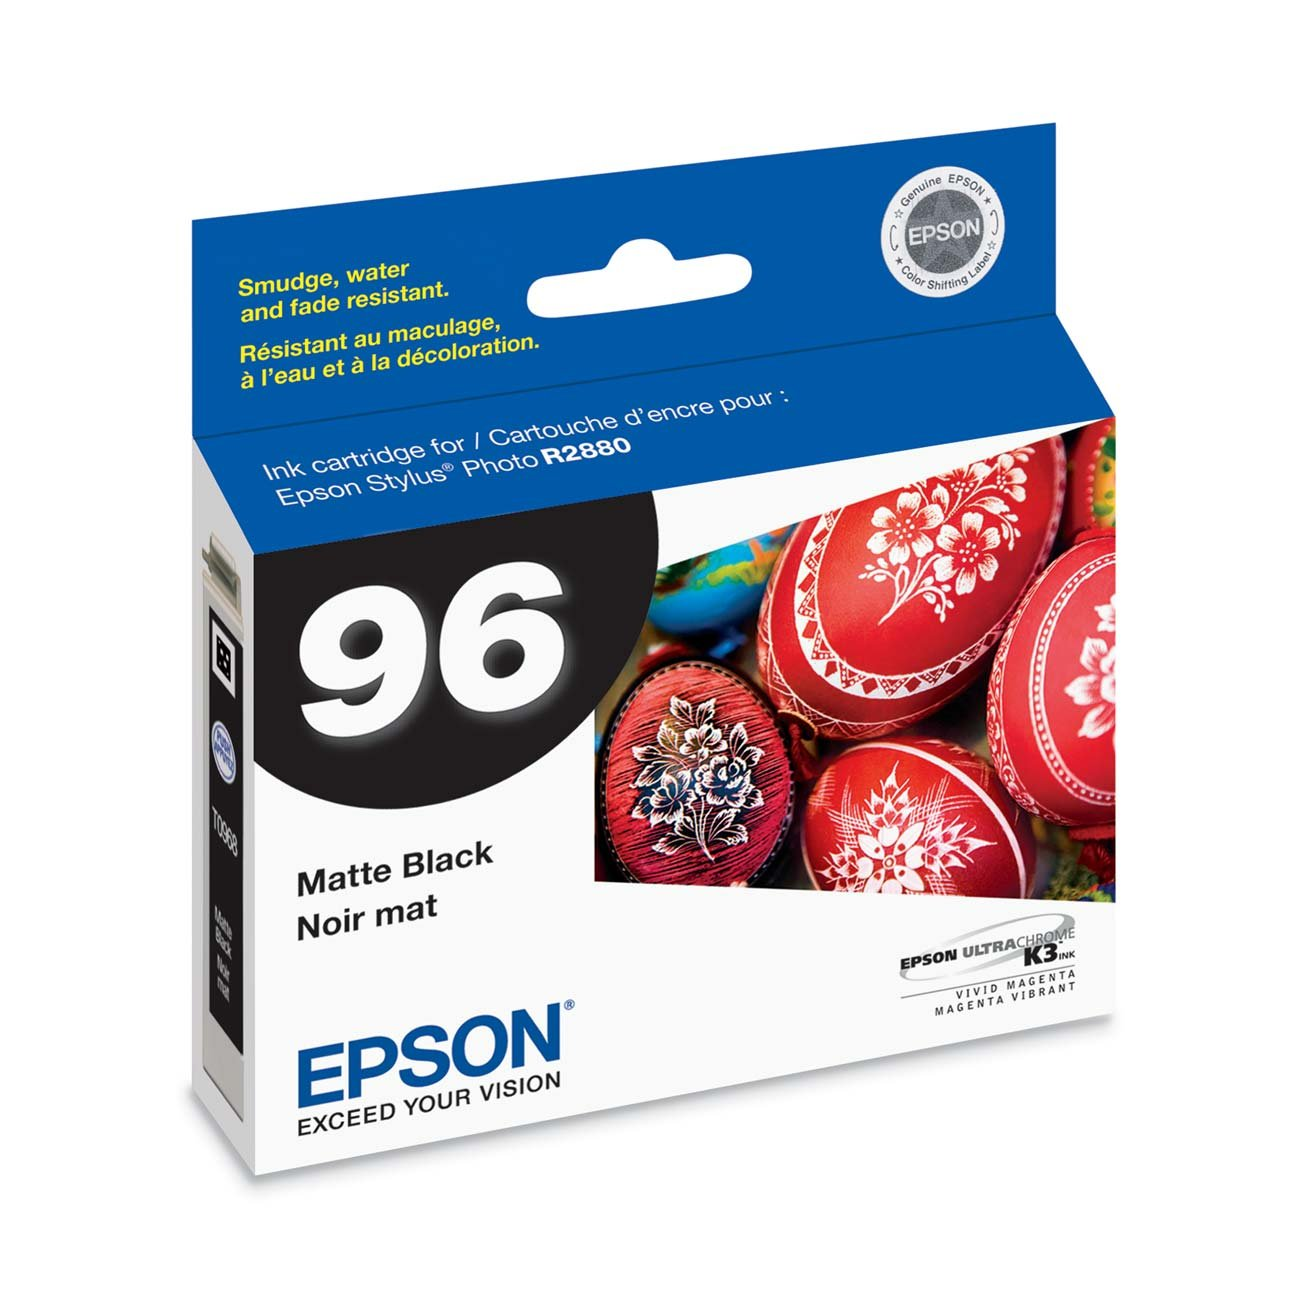 Epson T096820 Stylus Photo R2880 Printer UltraChrome K3 Ink Cartridge (Matte Black)